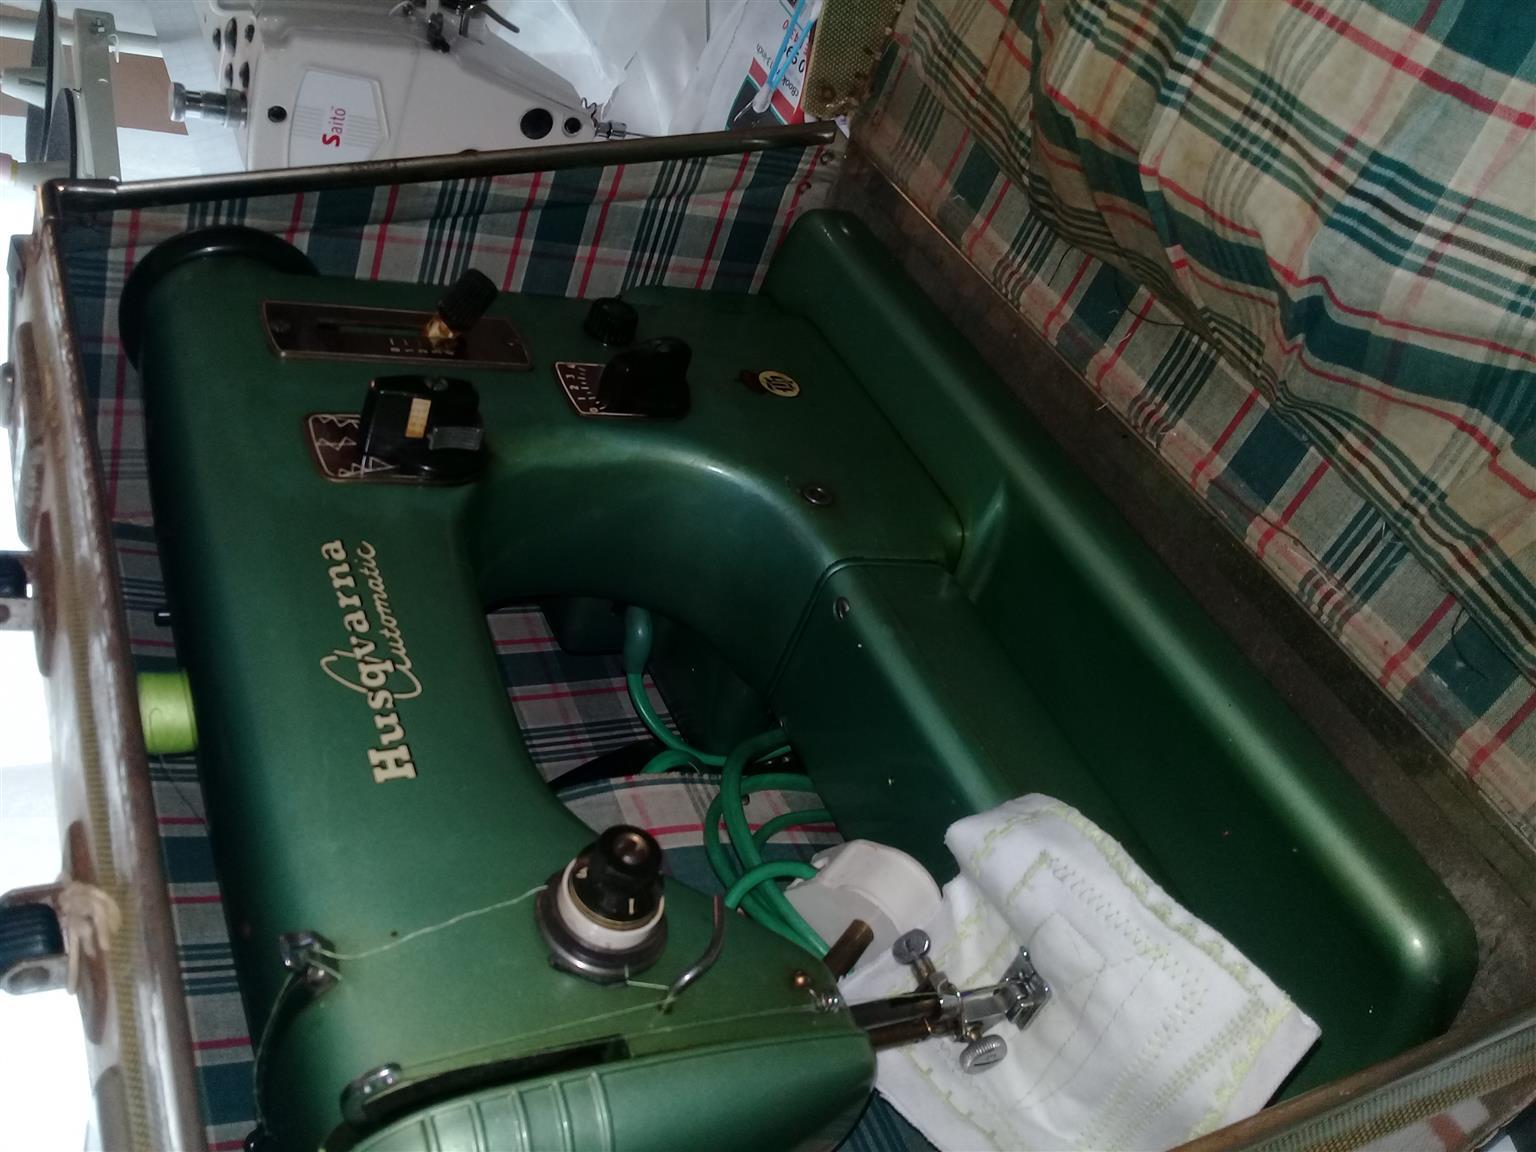 Husqvarna Sewing Machine for sale